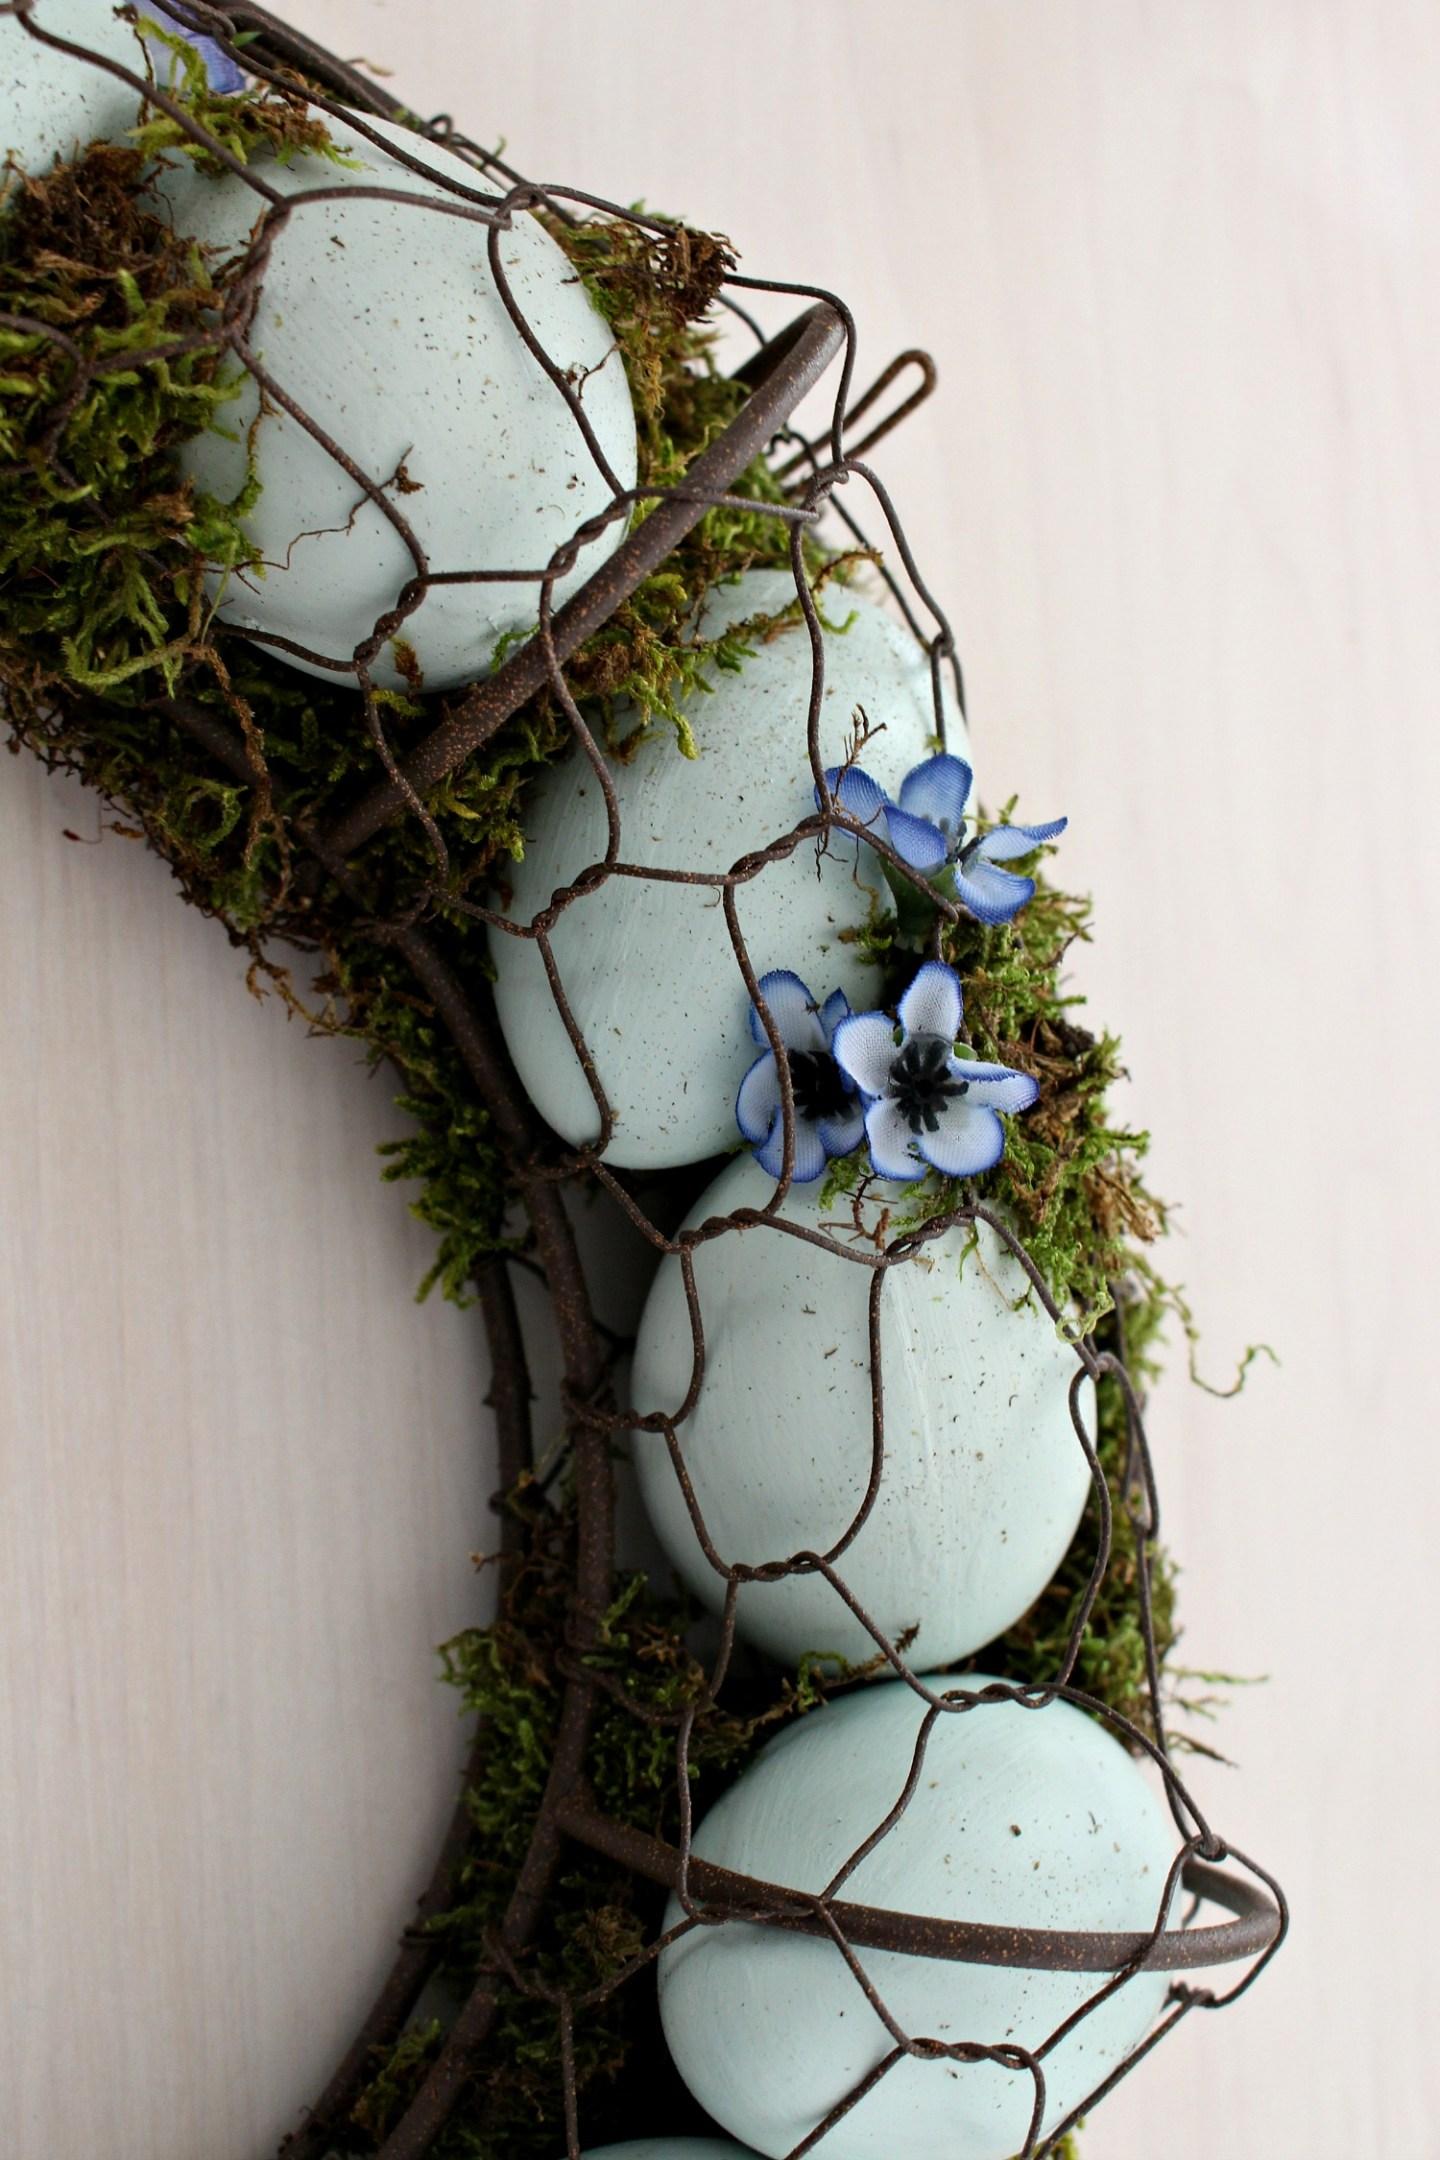 How to Make an Egg Wreath